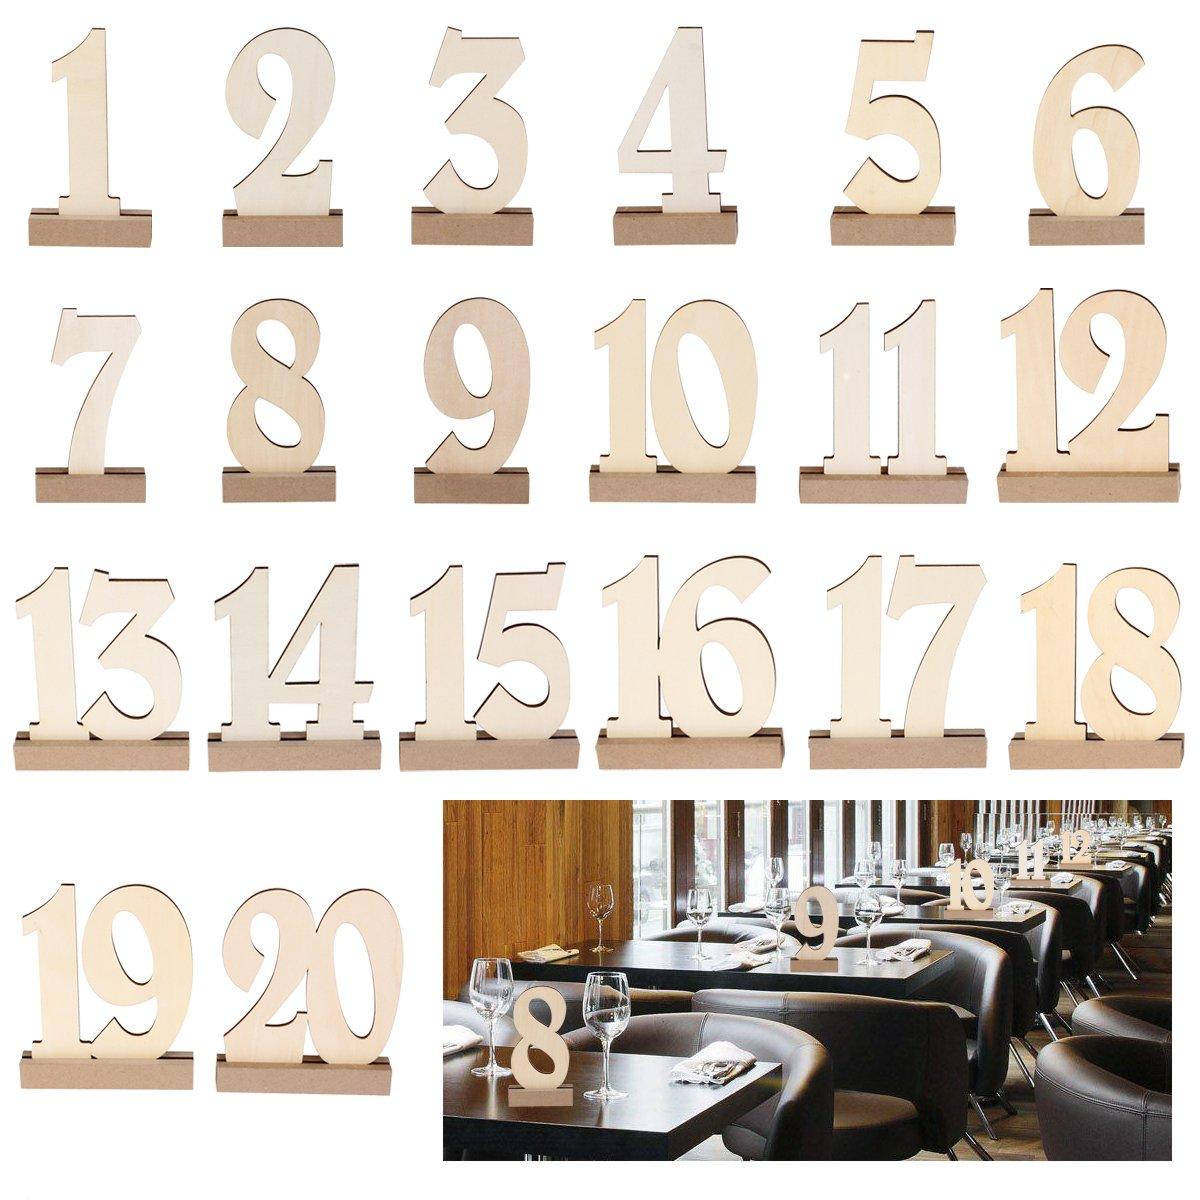 Numeri per tavoli ristorante fai da te jn57 regardsdefemmes - Tavoli rustici fai da te ...